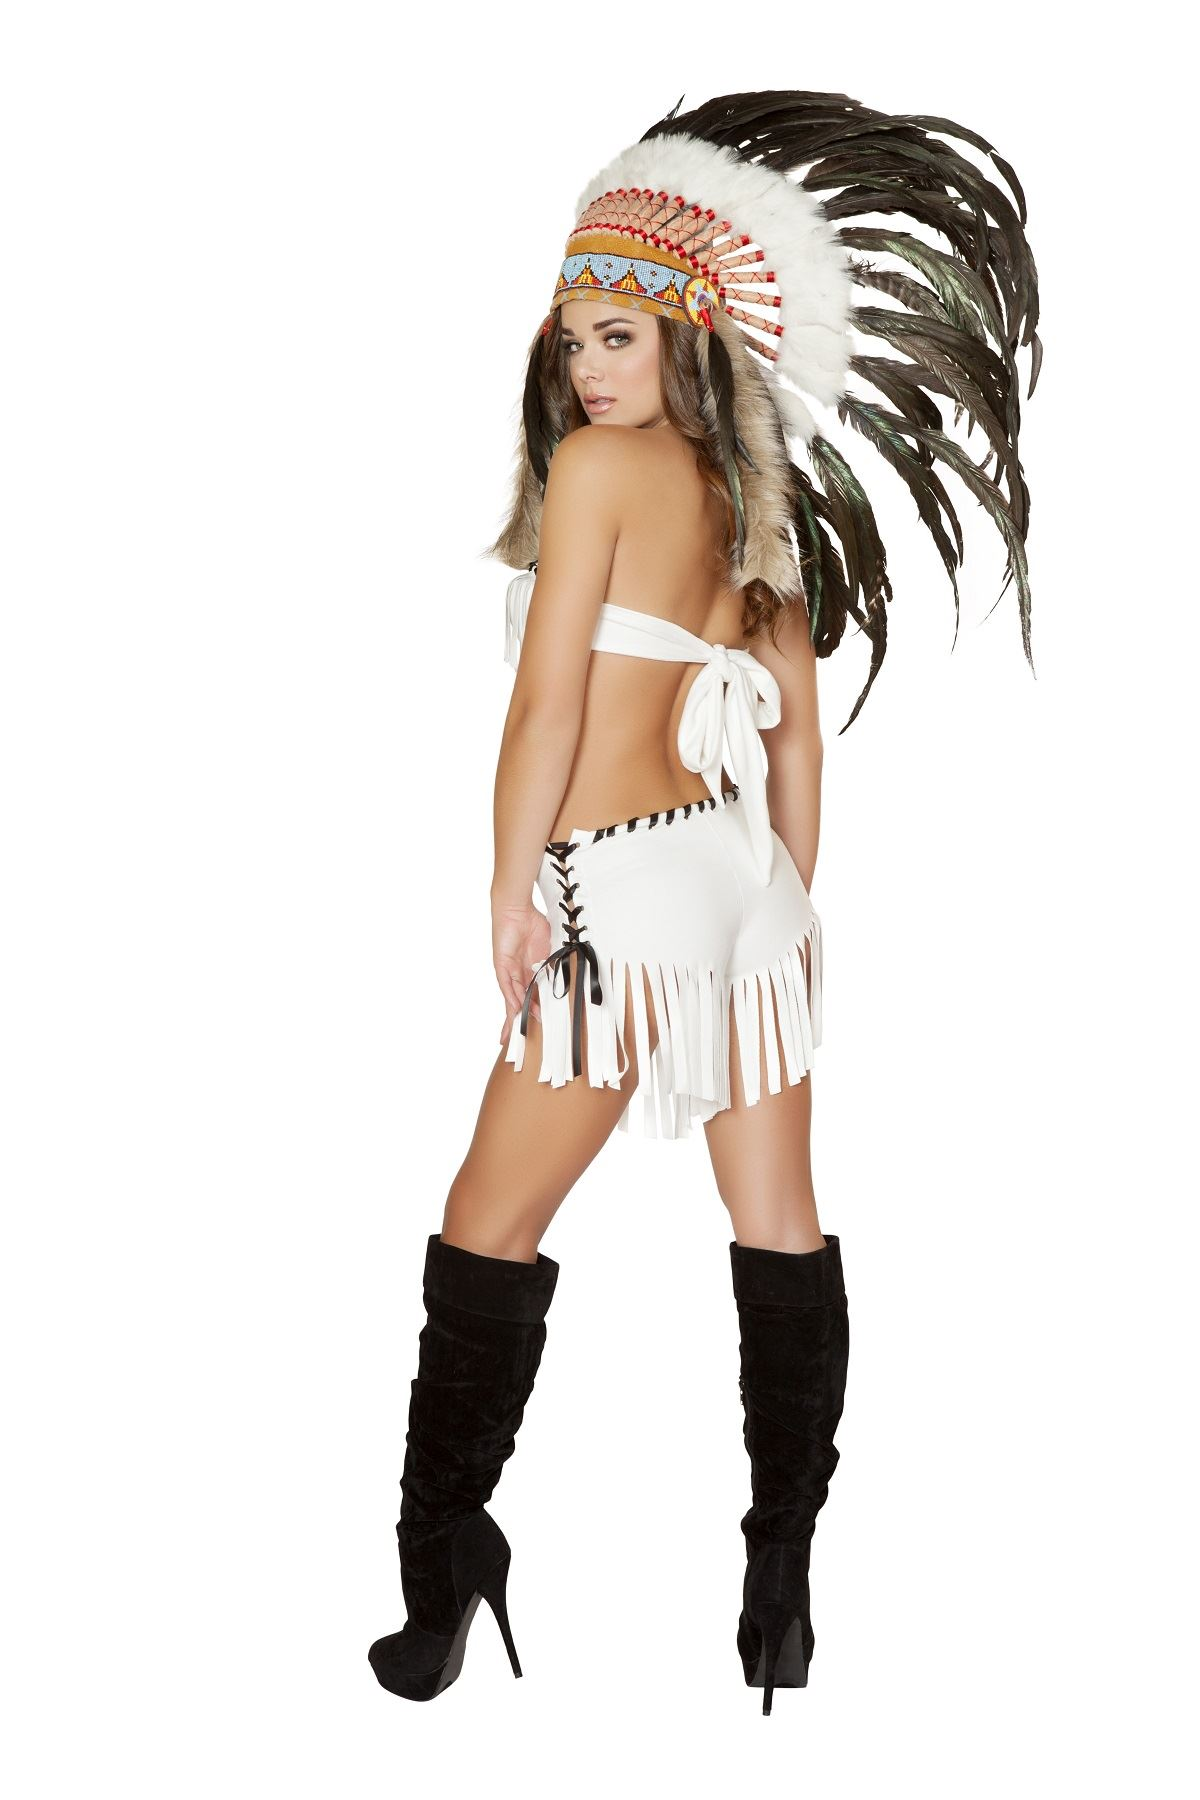 Native American Indian Women Tribal Princess Halloween CostumeNative American Tribal Women